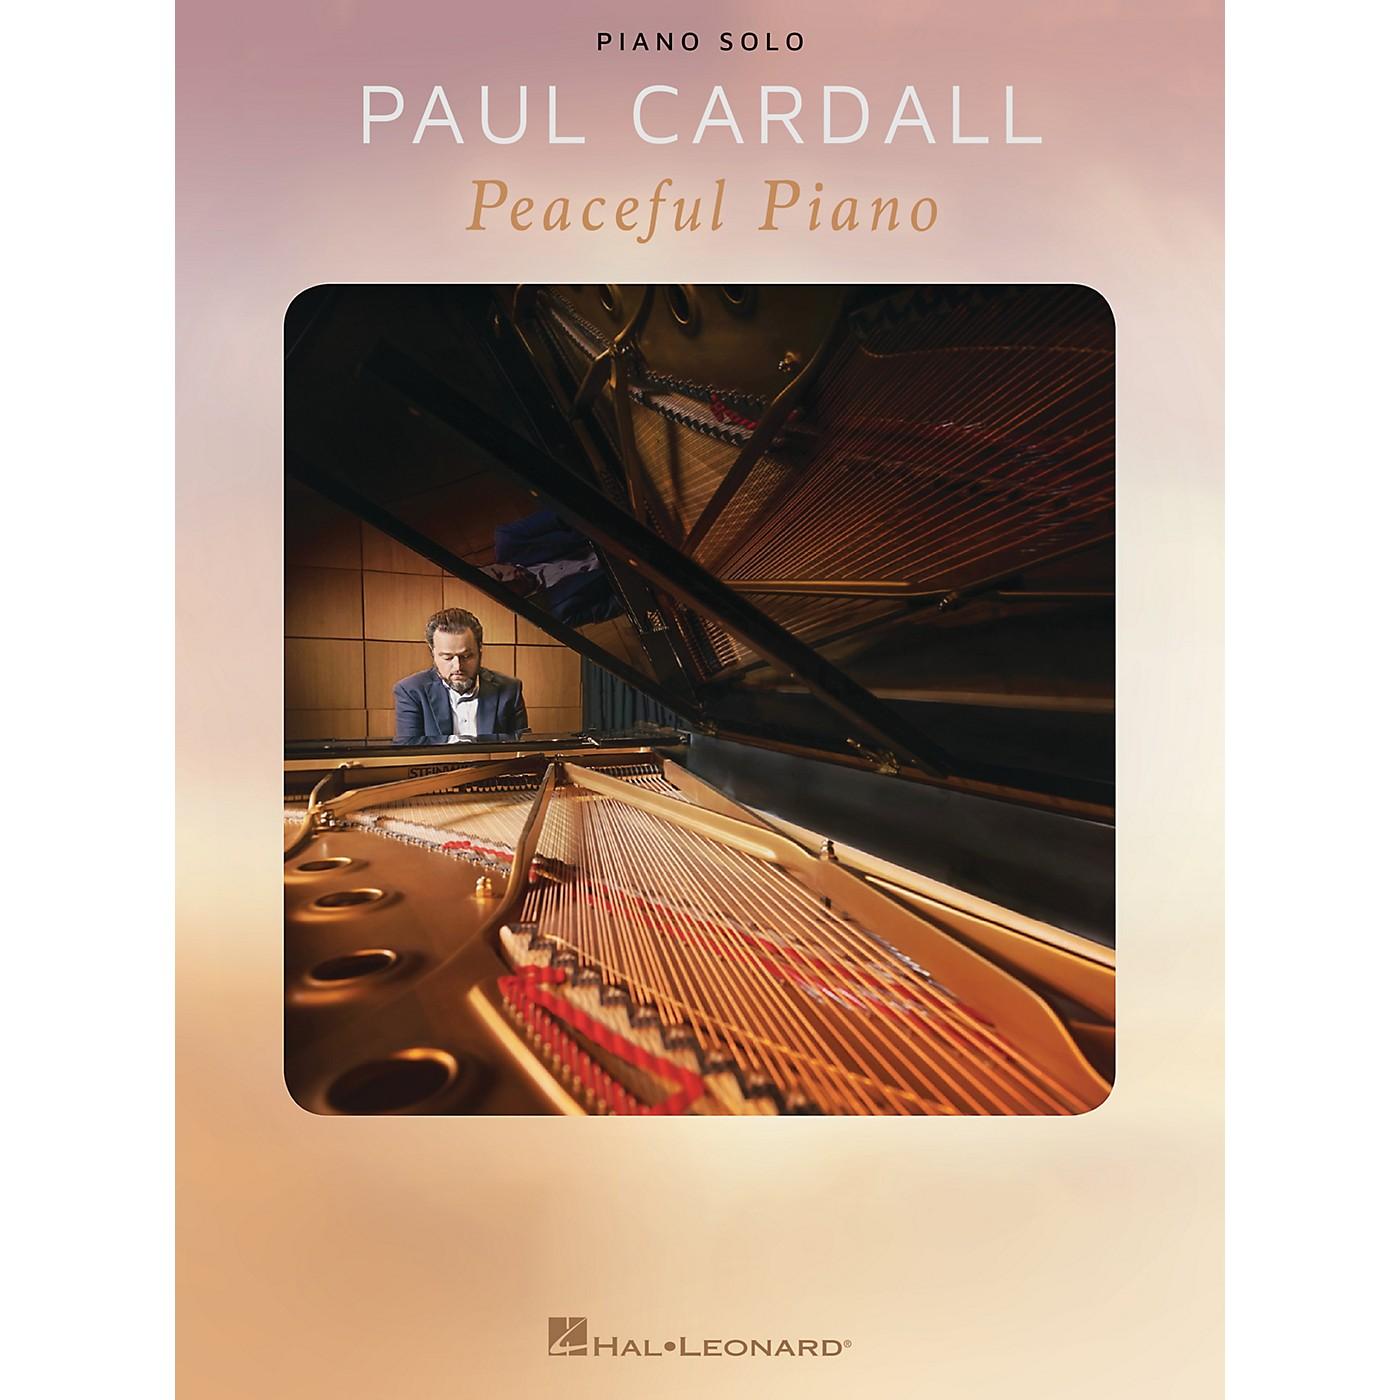 Hal Leonard Paul Cardall - Peaceful Piano Piano Solo Songbook thumbnail